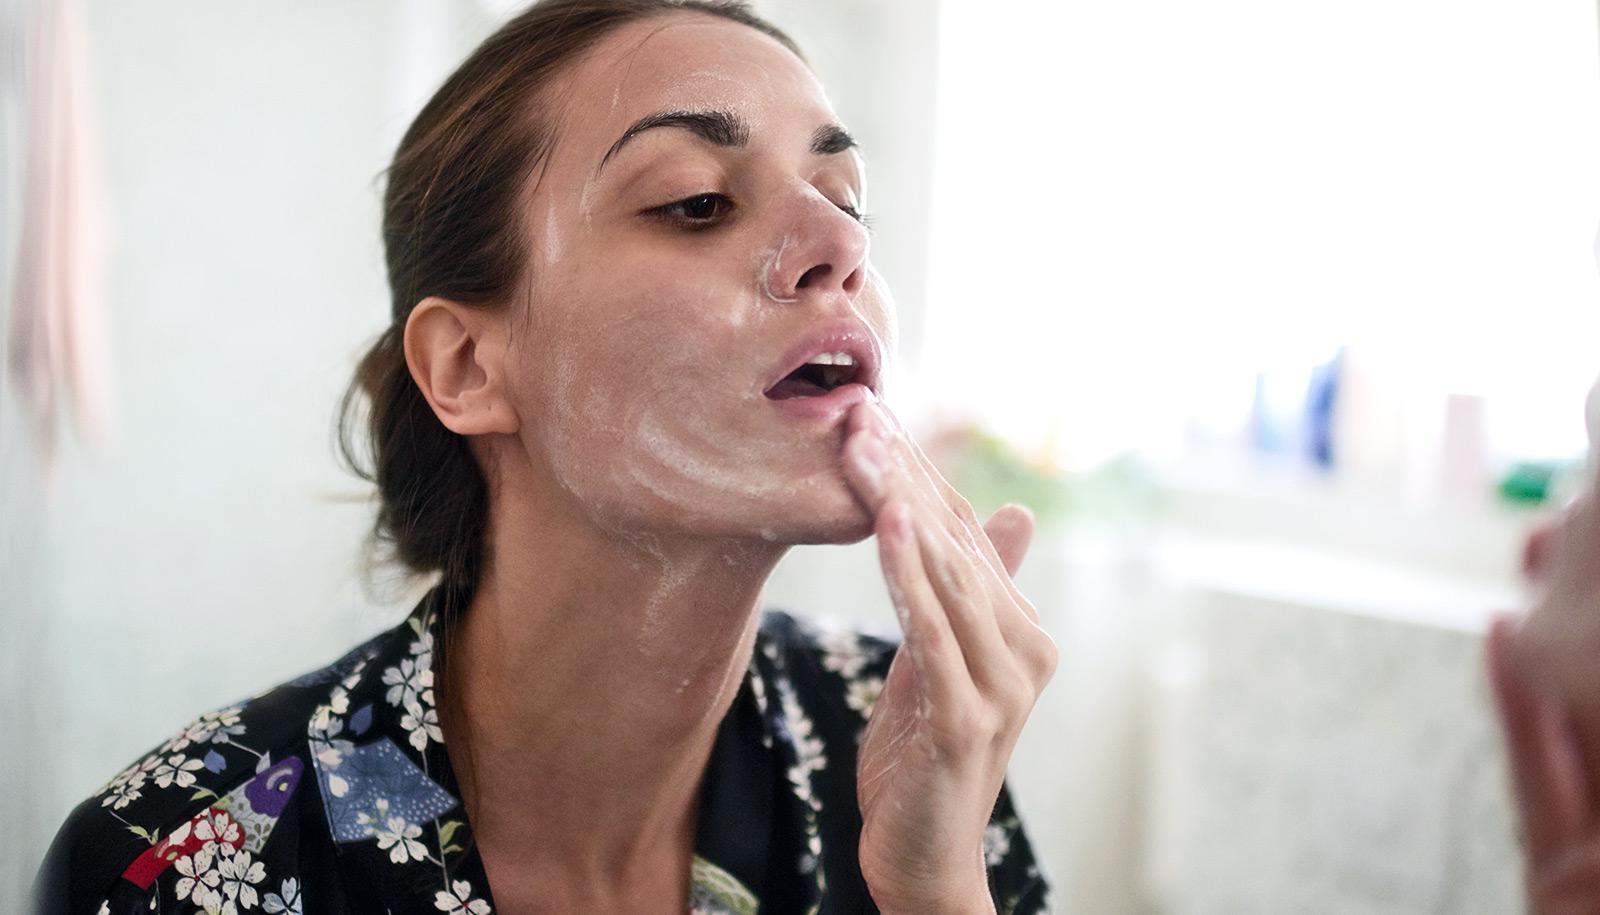 A woman rubs a skin cream onto her face